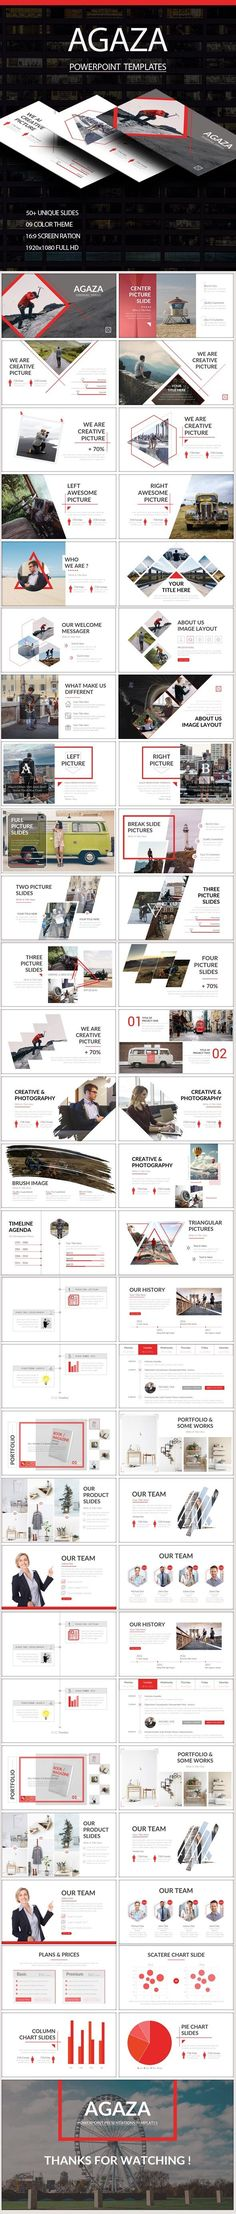 AGAZA PowerPoint Templates. Download here: https://graphicriver.net/item/agaza-powerpoint-templates/16995326?ref=ksioks